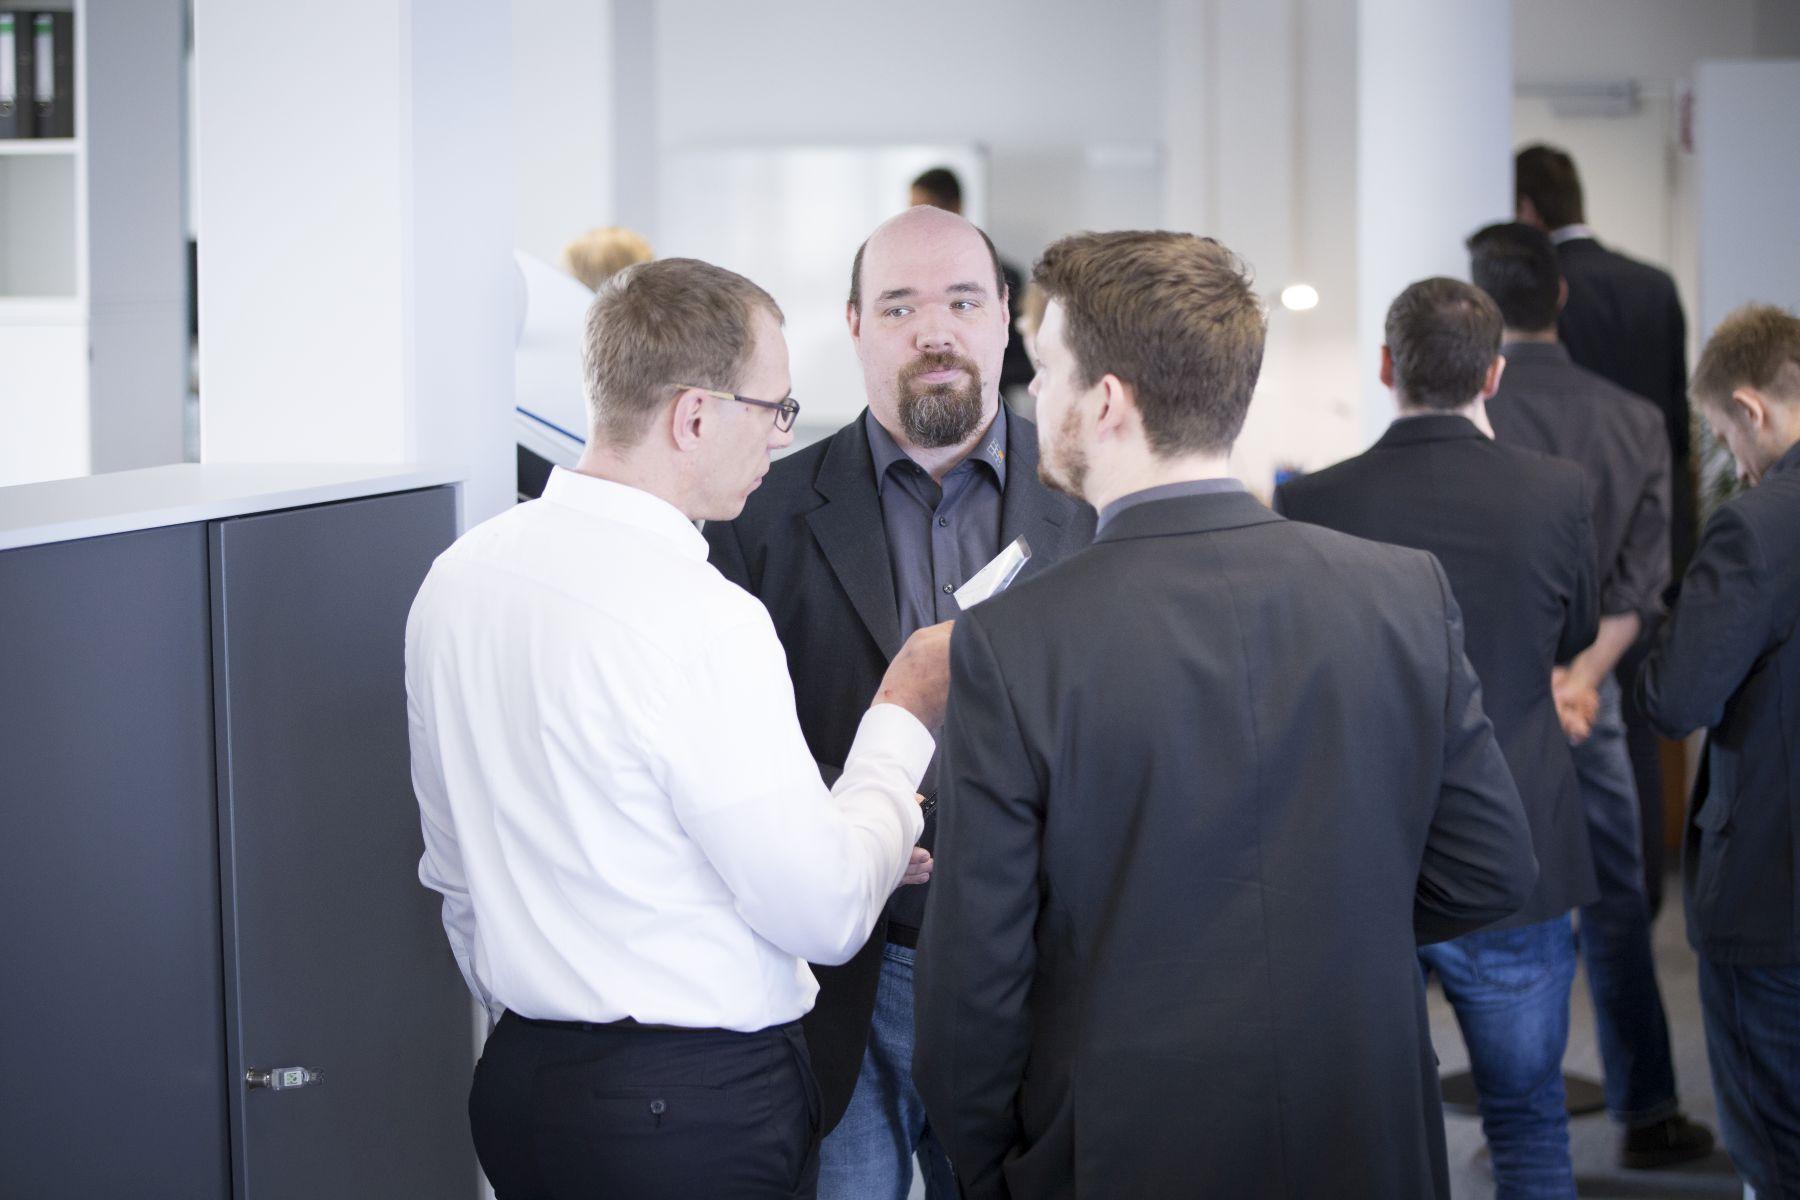 Rückblick: Ergonomie in 5 Punkten - Infoveranstaltung bei Büromöbel-Experte 16